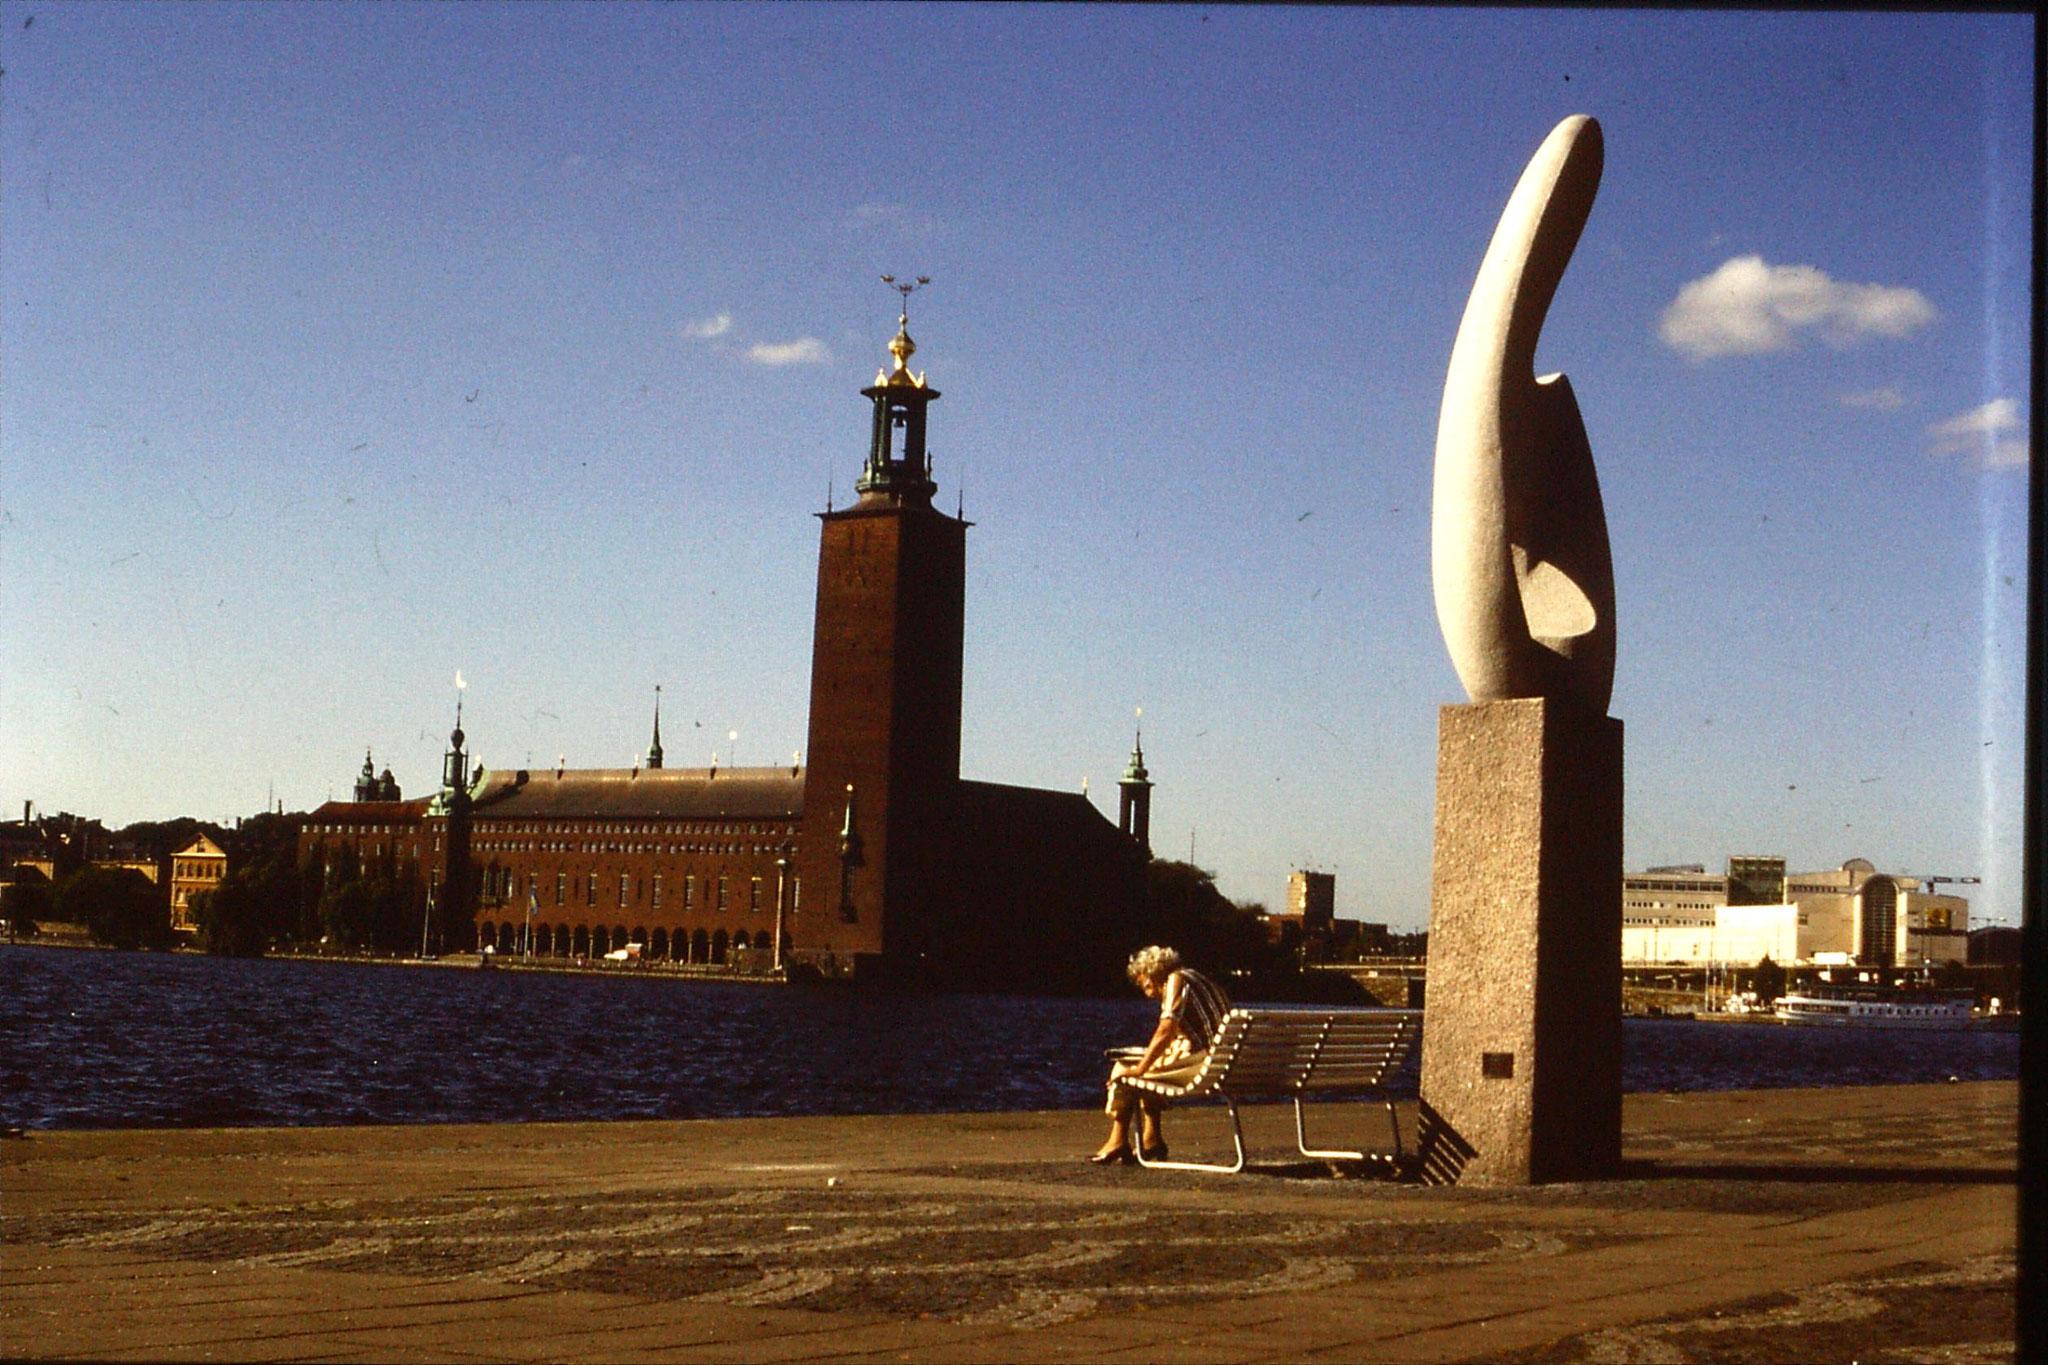 8/9/1988: 34: Radhuset